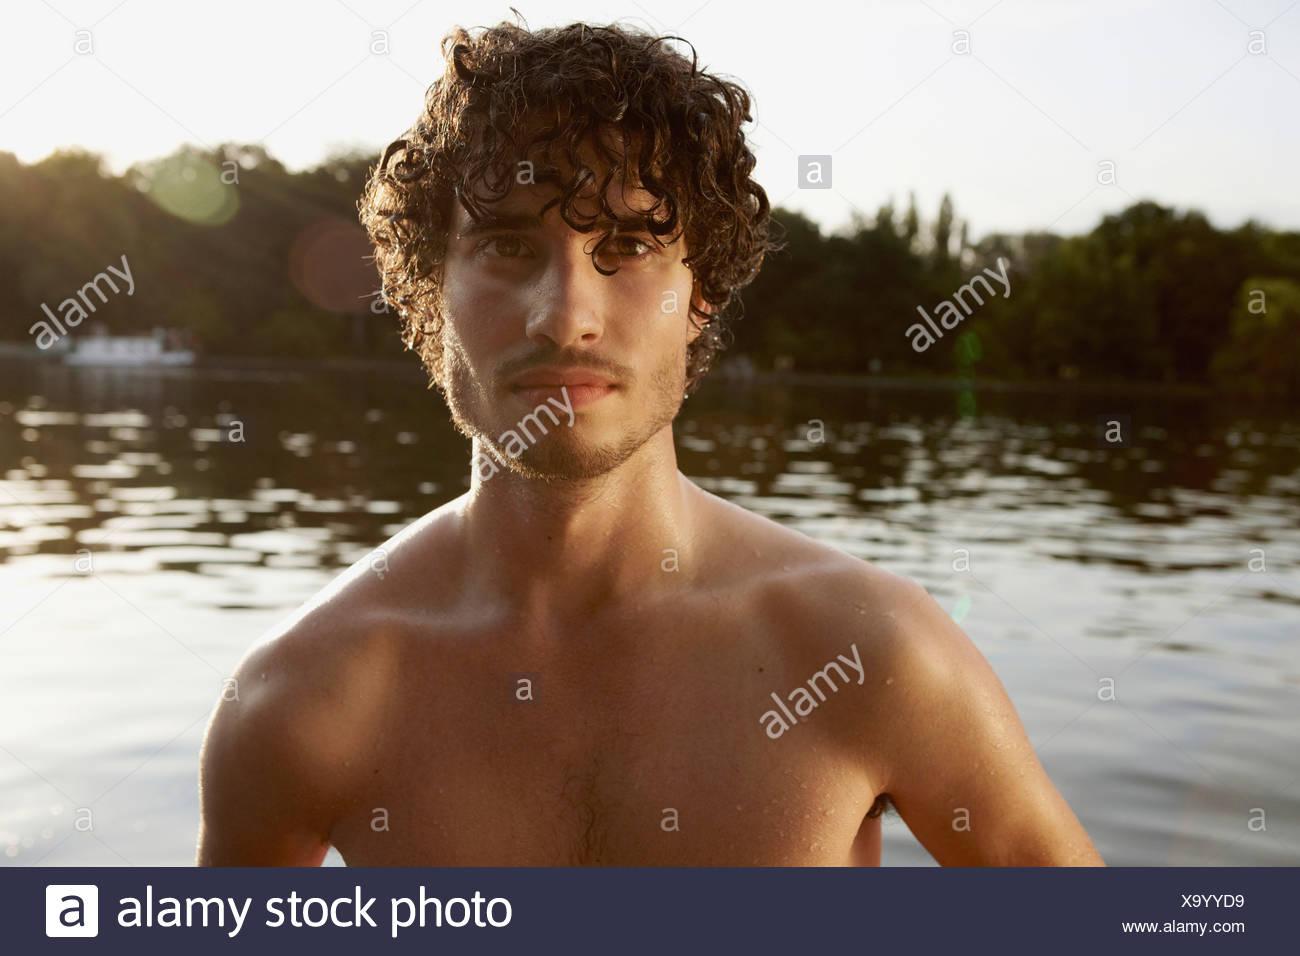 Germany, Berlin, Barechested man, portrait - Stock Image